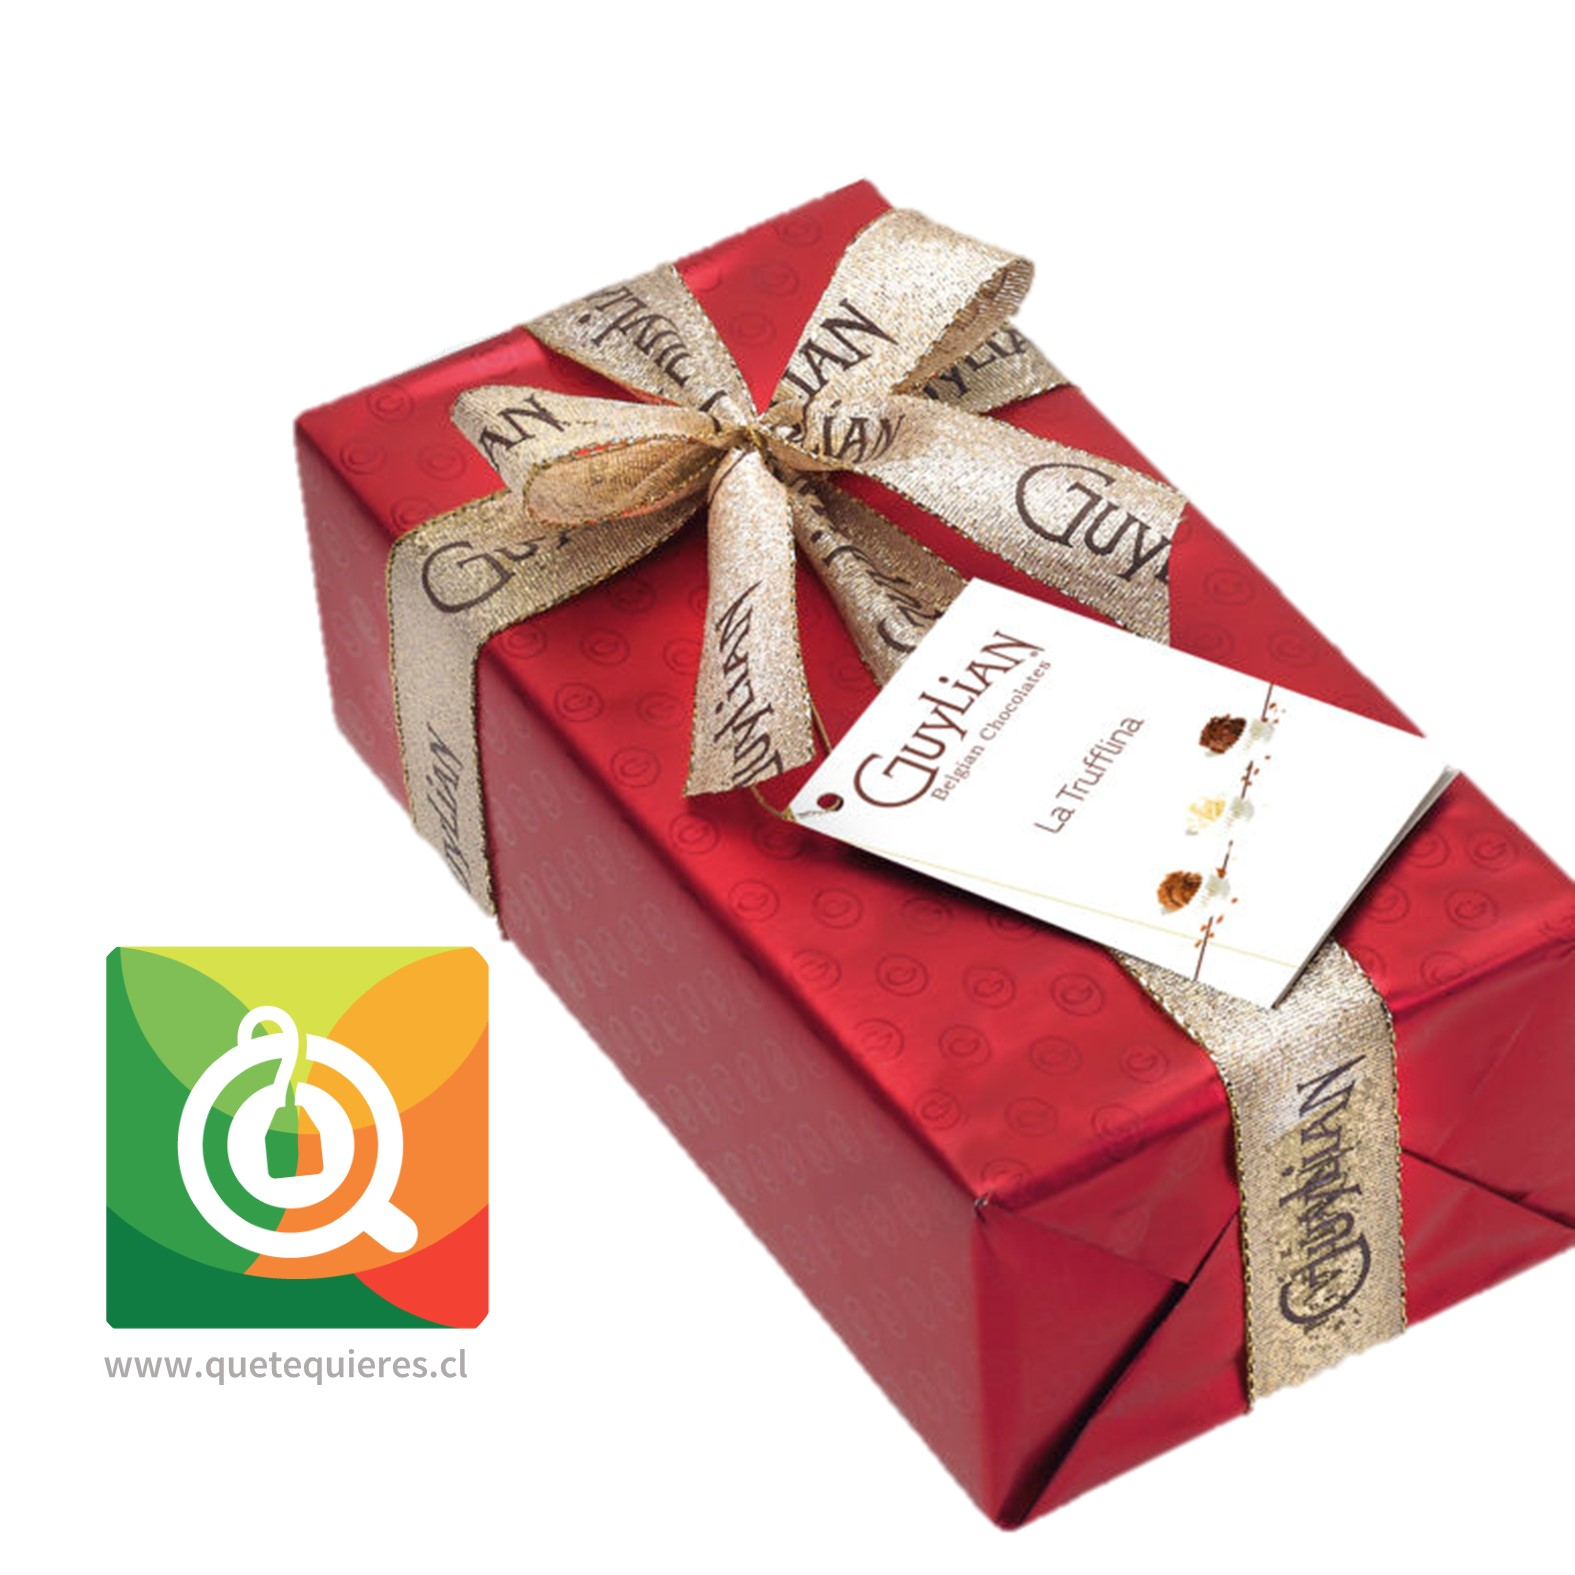 Guylian Bombon Chocolate Trufflina- Image 1